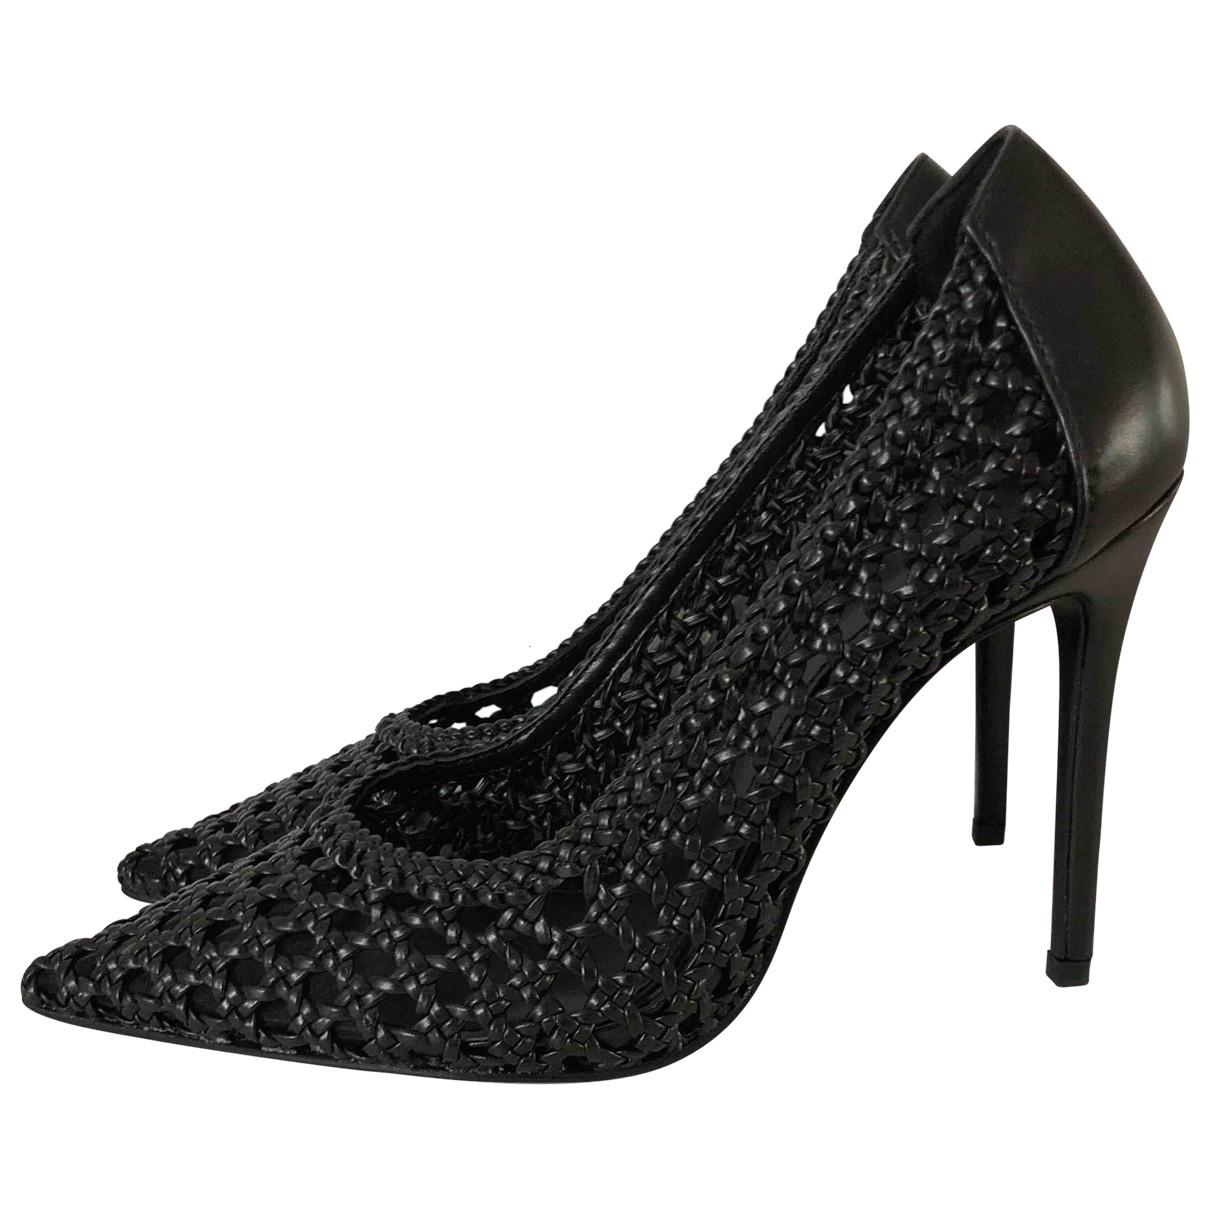 Zara \N Black Leather Heels for Women 37 EU